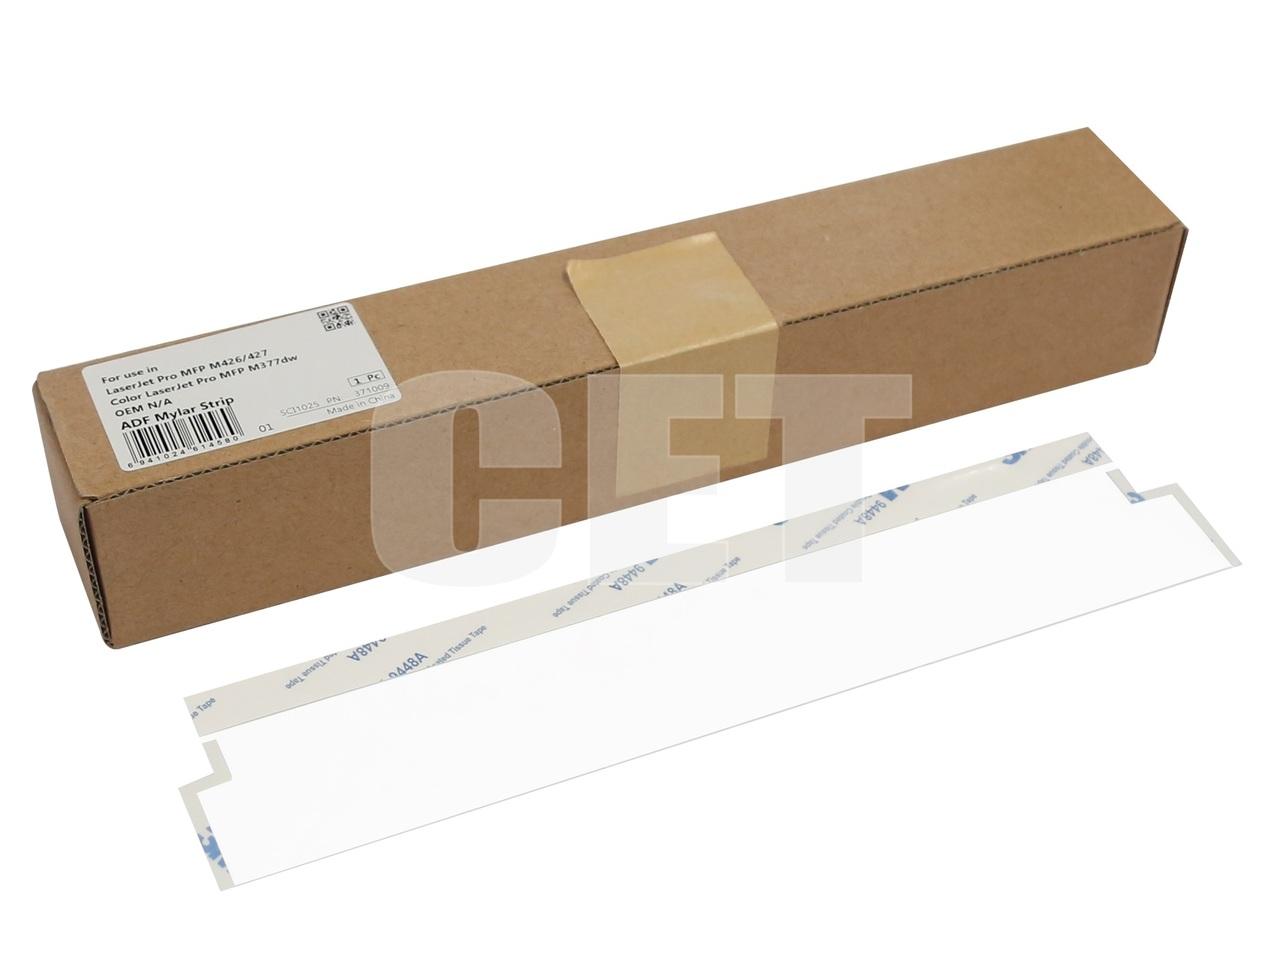 Майларовая накладка ADF для HP LaserJet Pro MFPM426/427/477fdn (CET), CET371009